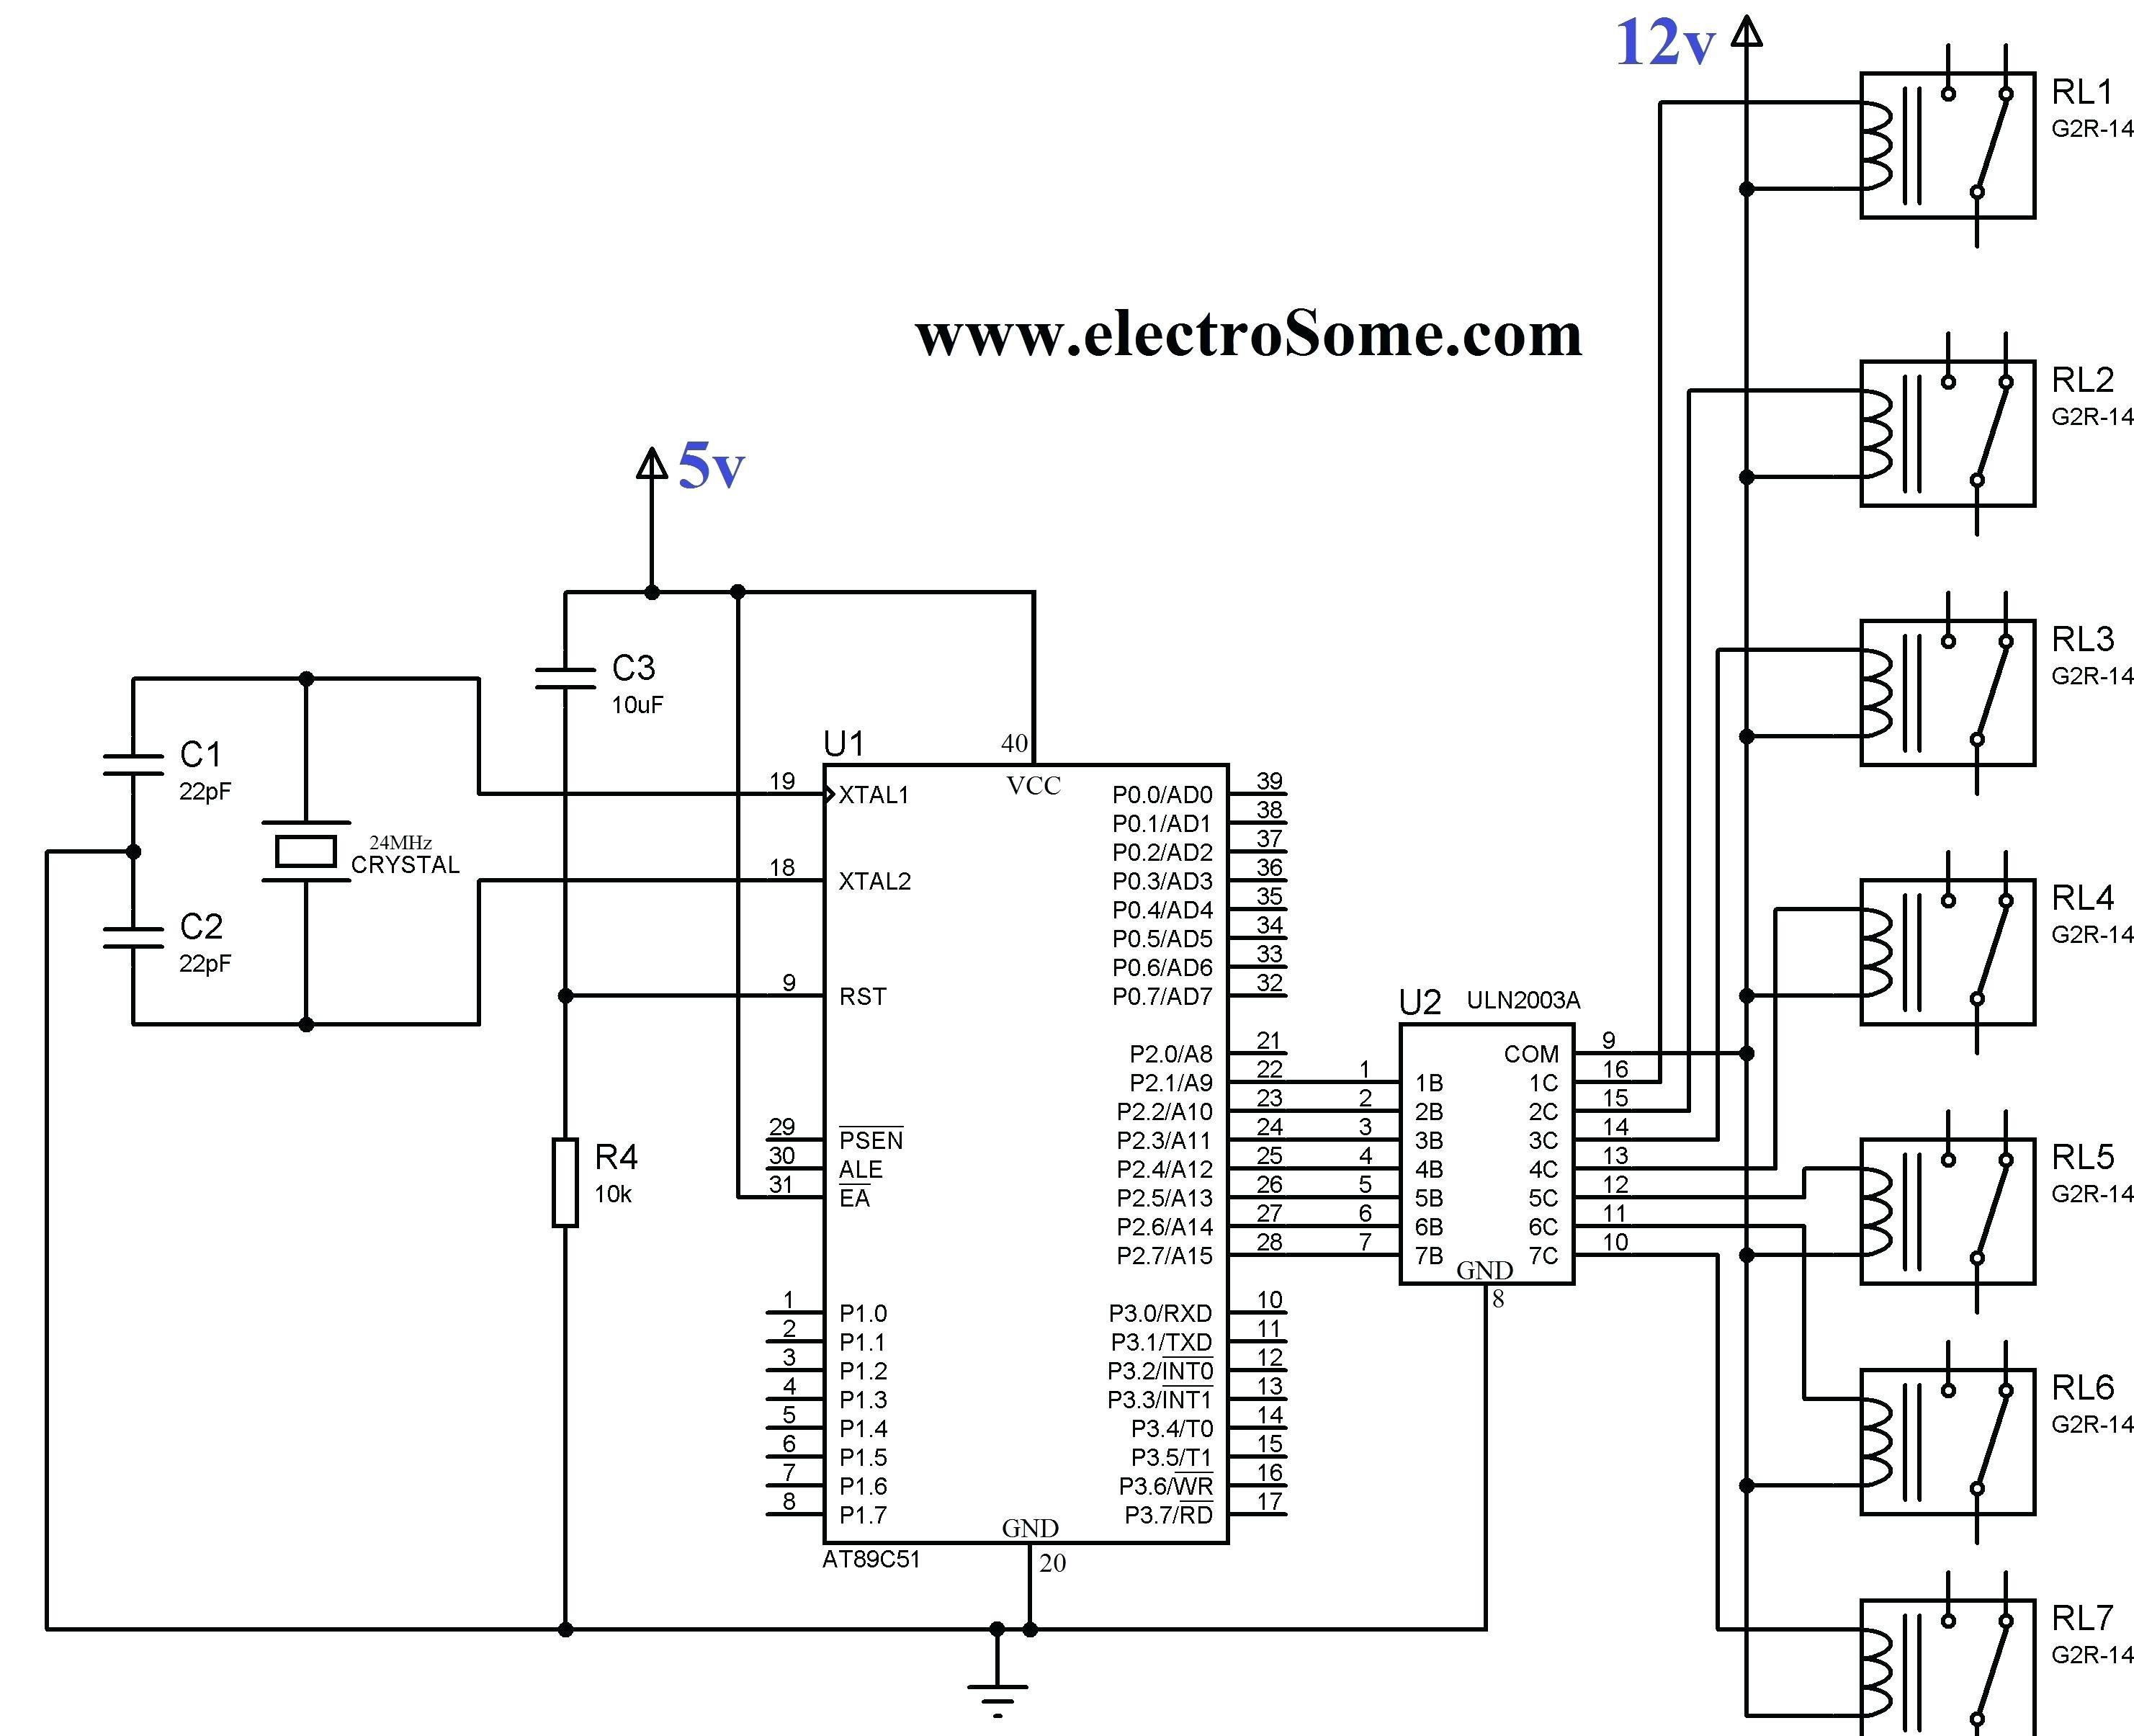 Transfer Switch Wiring Diagram Car Diagram 15 Remarkable 3 Phase Switch Wiring 3 Phase Switch Of Transfer Switch Wiring Diagram